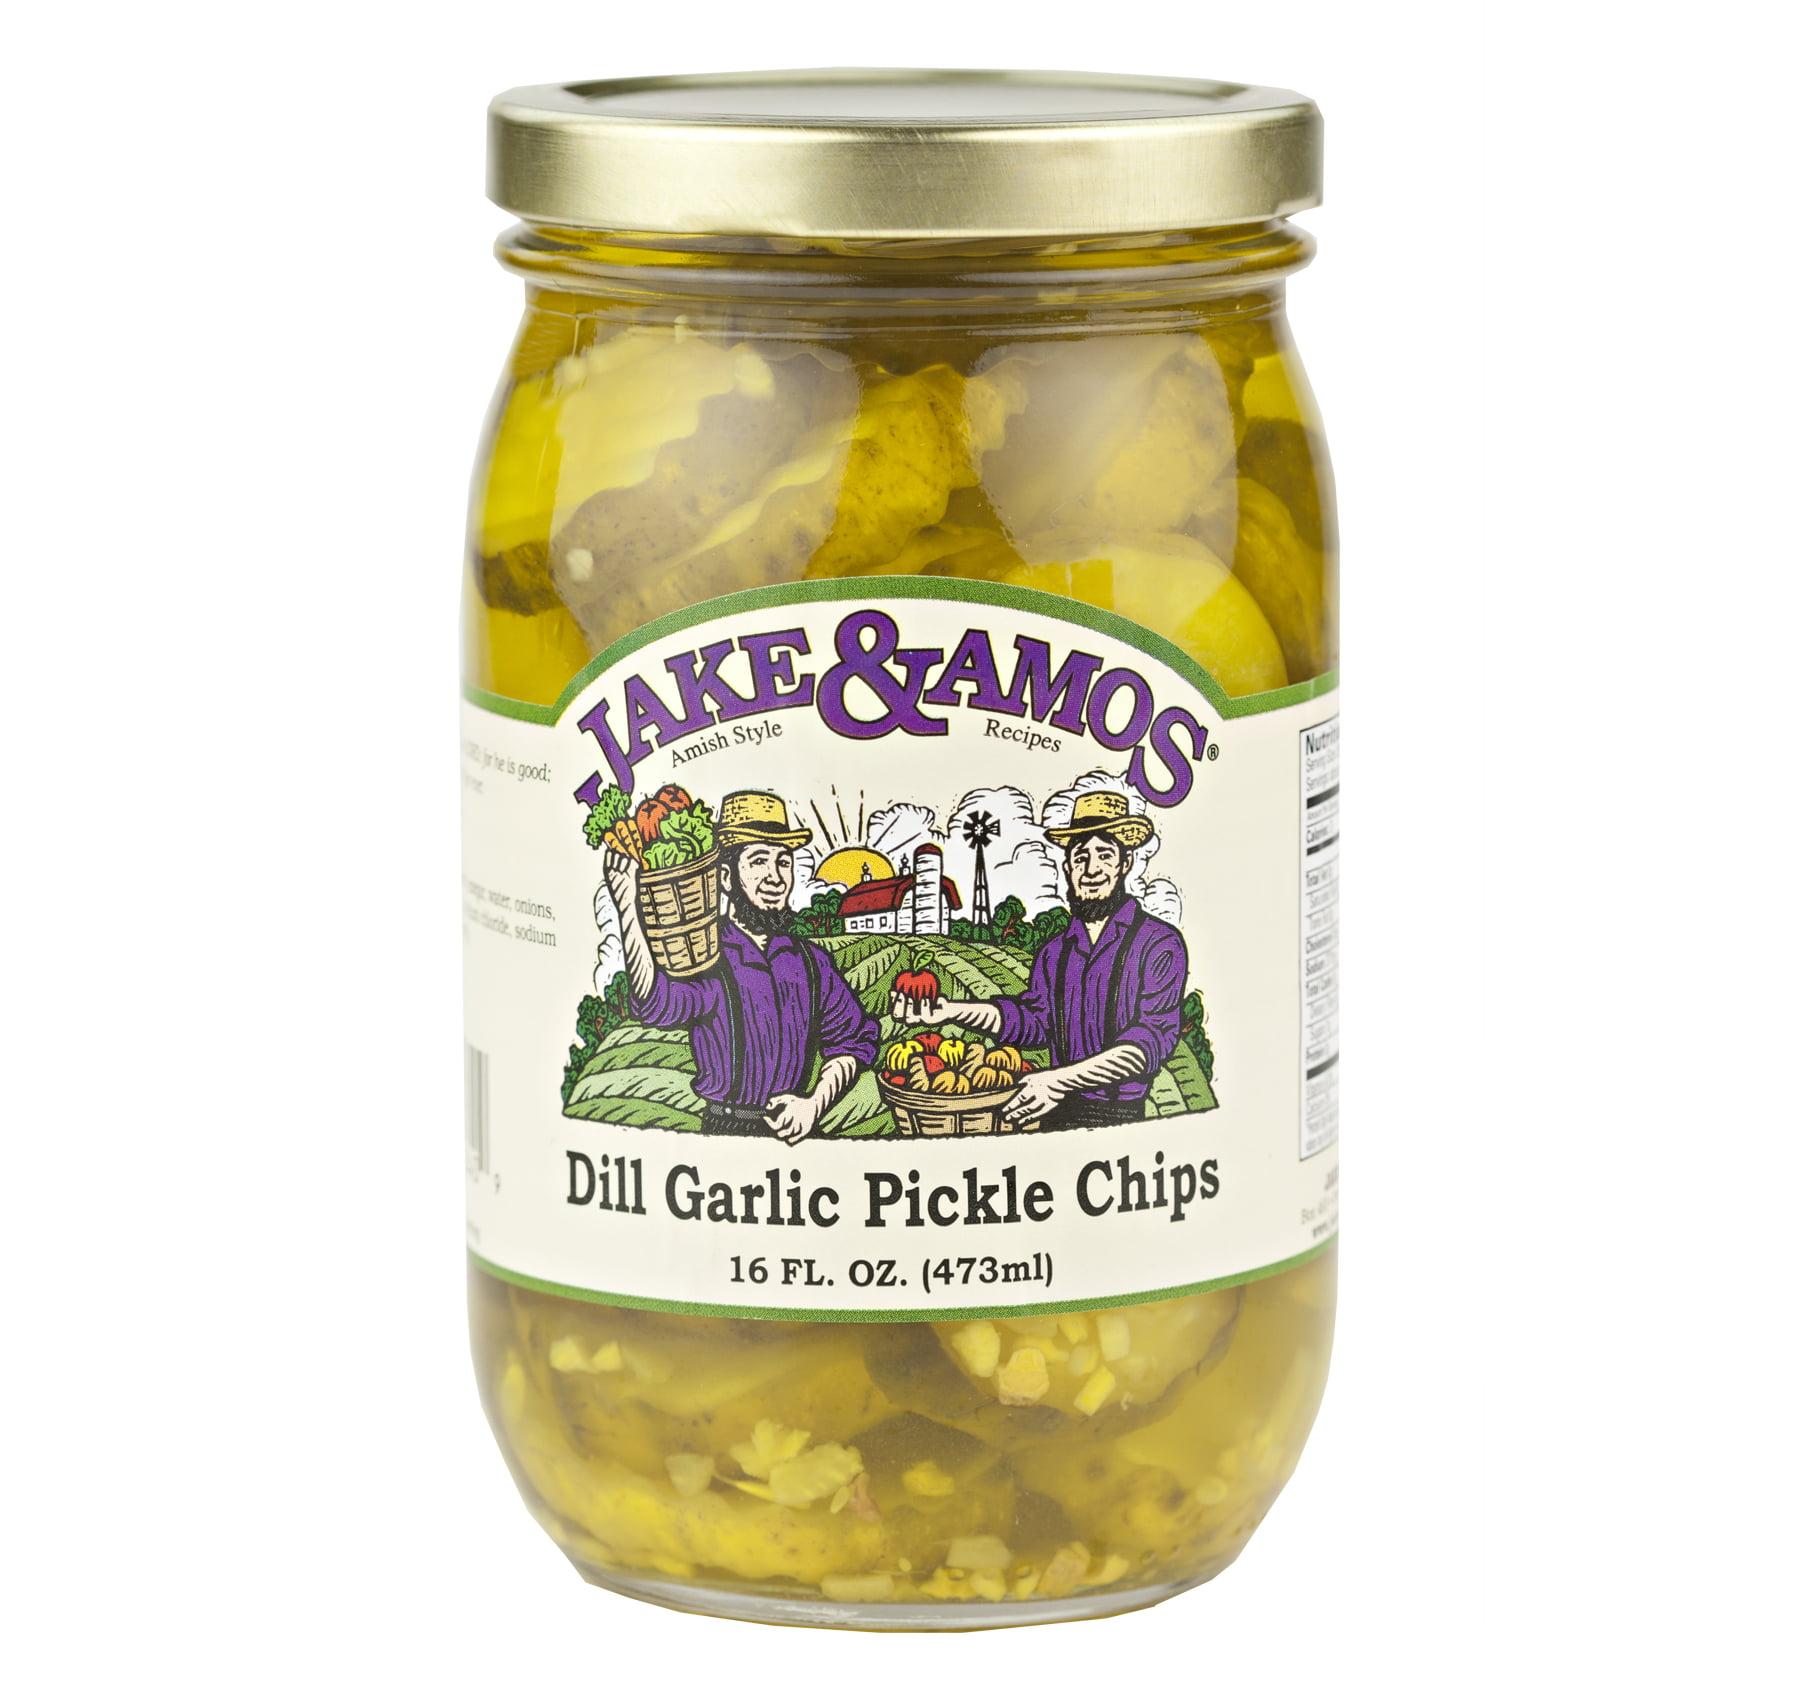 Jake & Amos Dill Garlic Pickle Chips 16 oz. Jar (2 Jars)